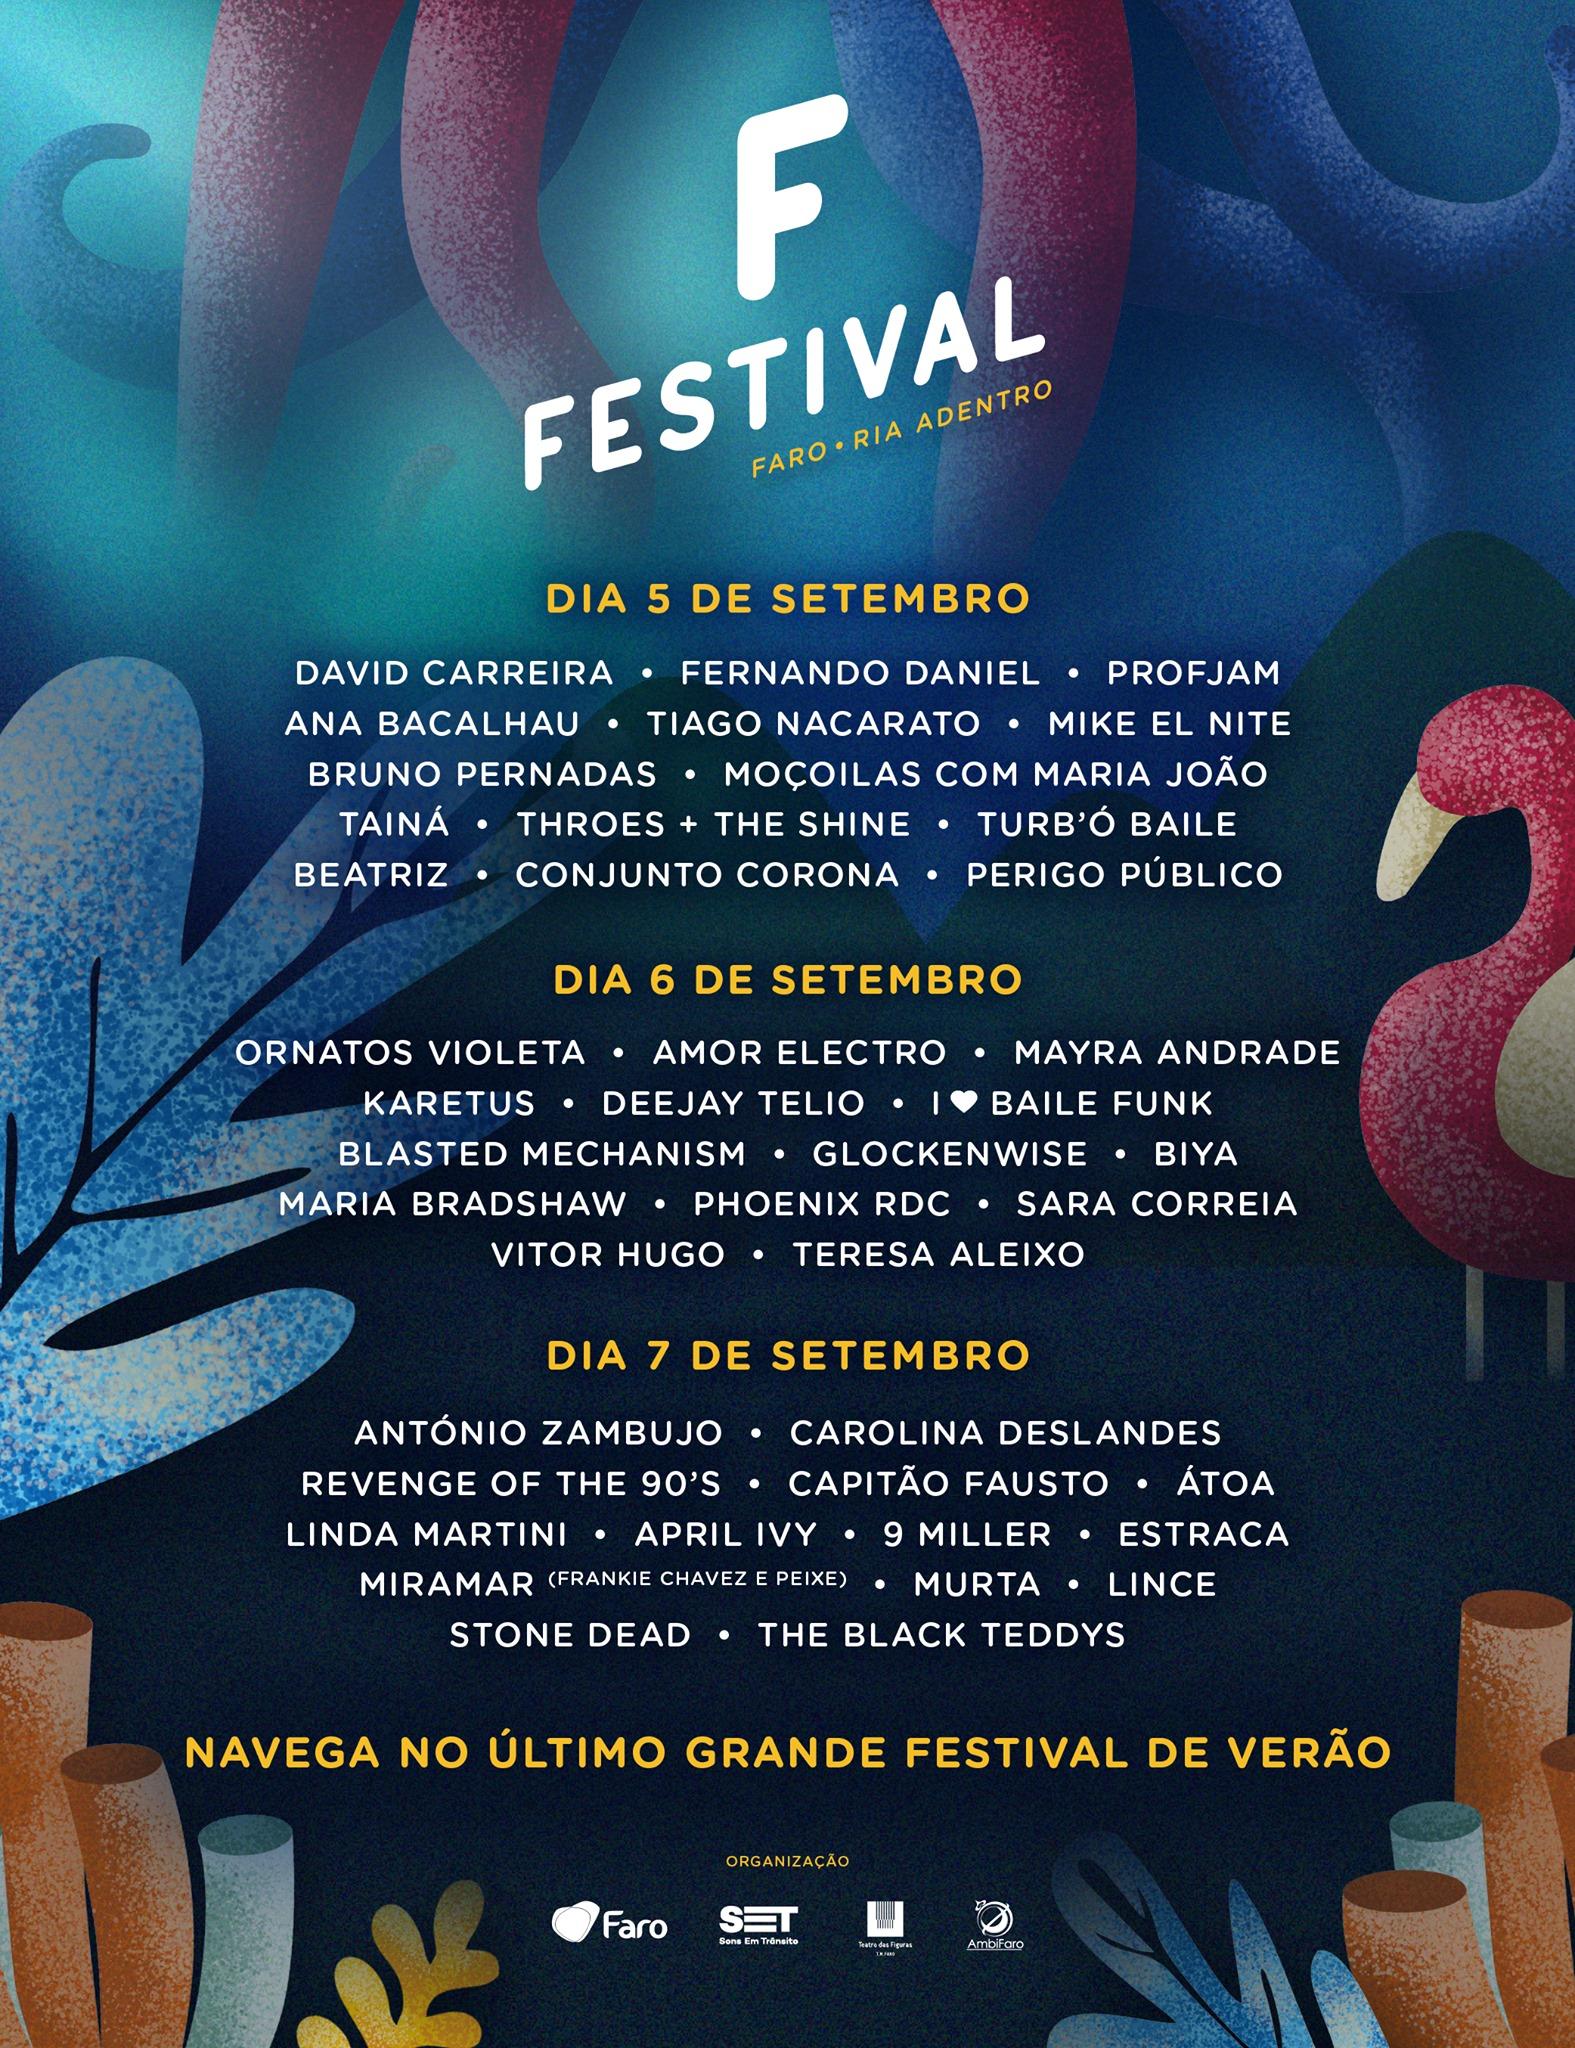 Perigo Público x Sickonce @ Festival F